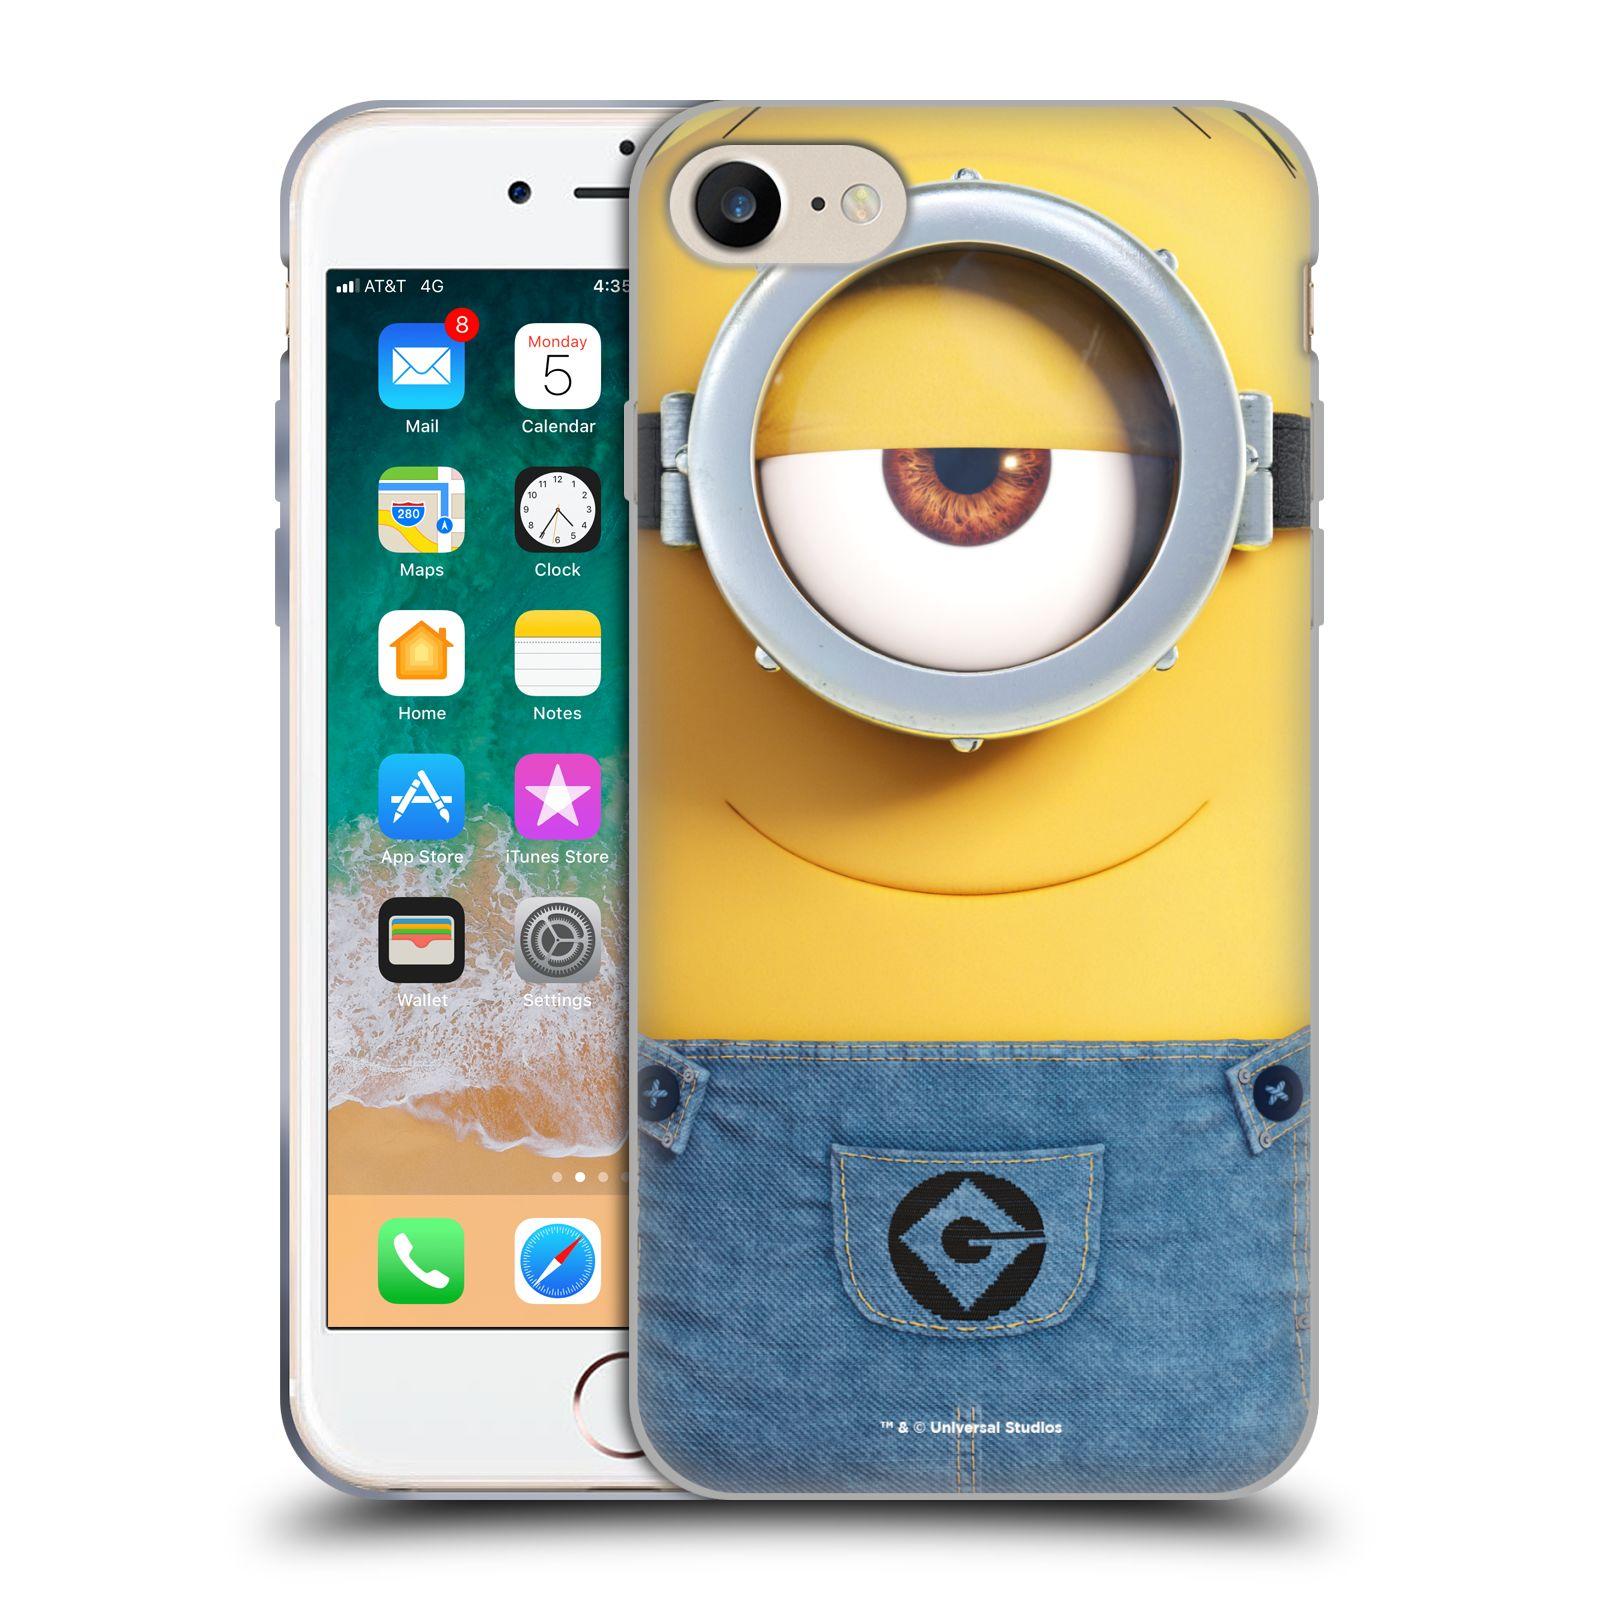 Silikonové pouzdro na mobil Apple iPhone SE (2020) - Head Case - Mimoň Stuart z filmu Já, padouch - Despicable Me